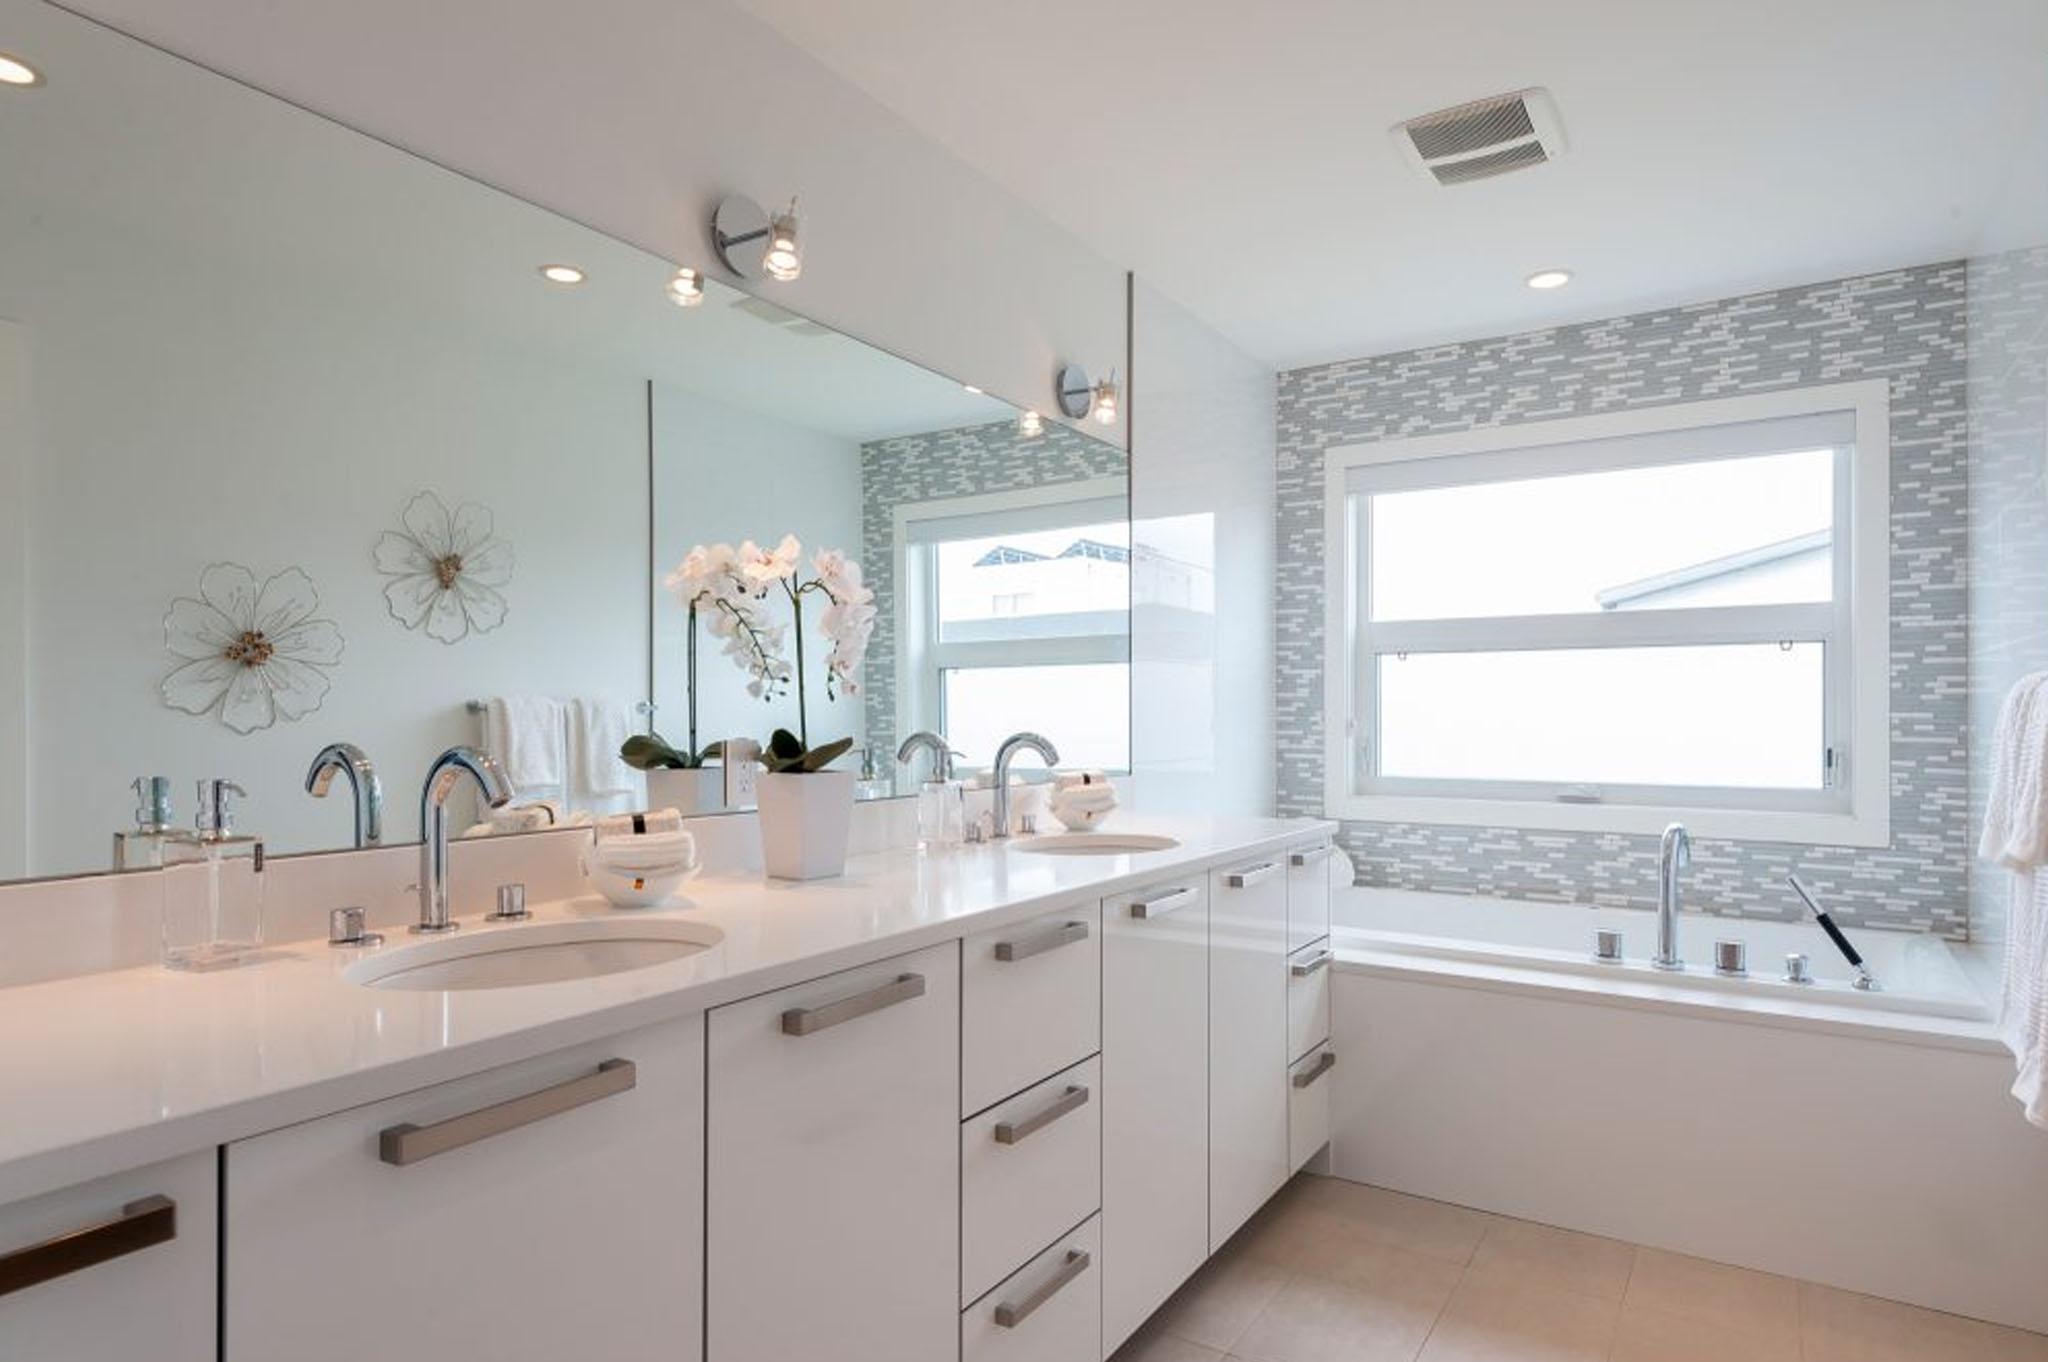 7 Faucet Finishes For Fabulous Bathrooms: Crash Course In Bathroom Faucet Finishes * Let's Get